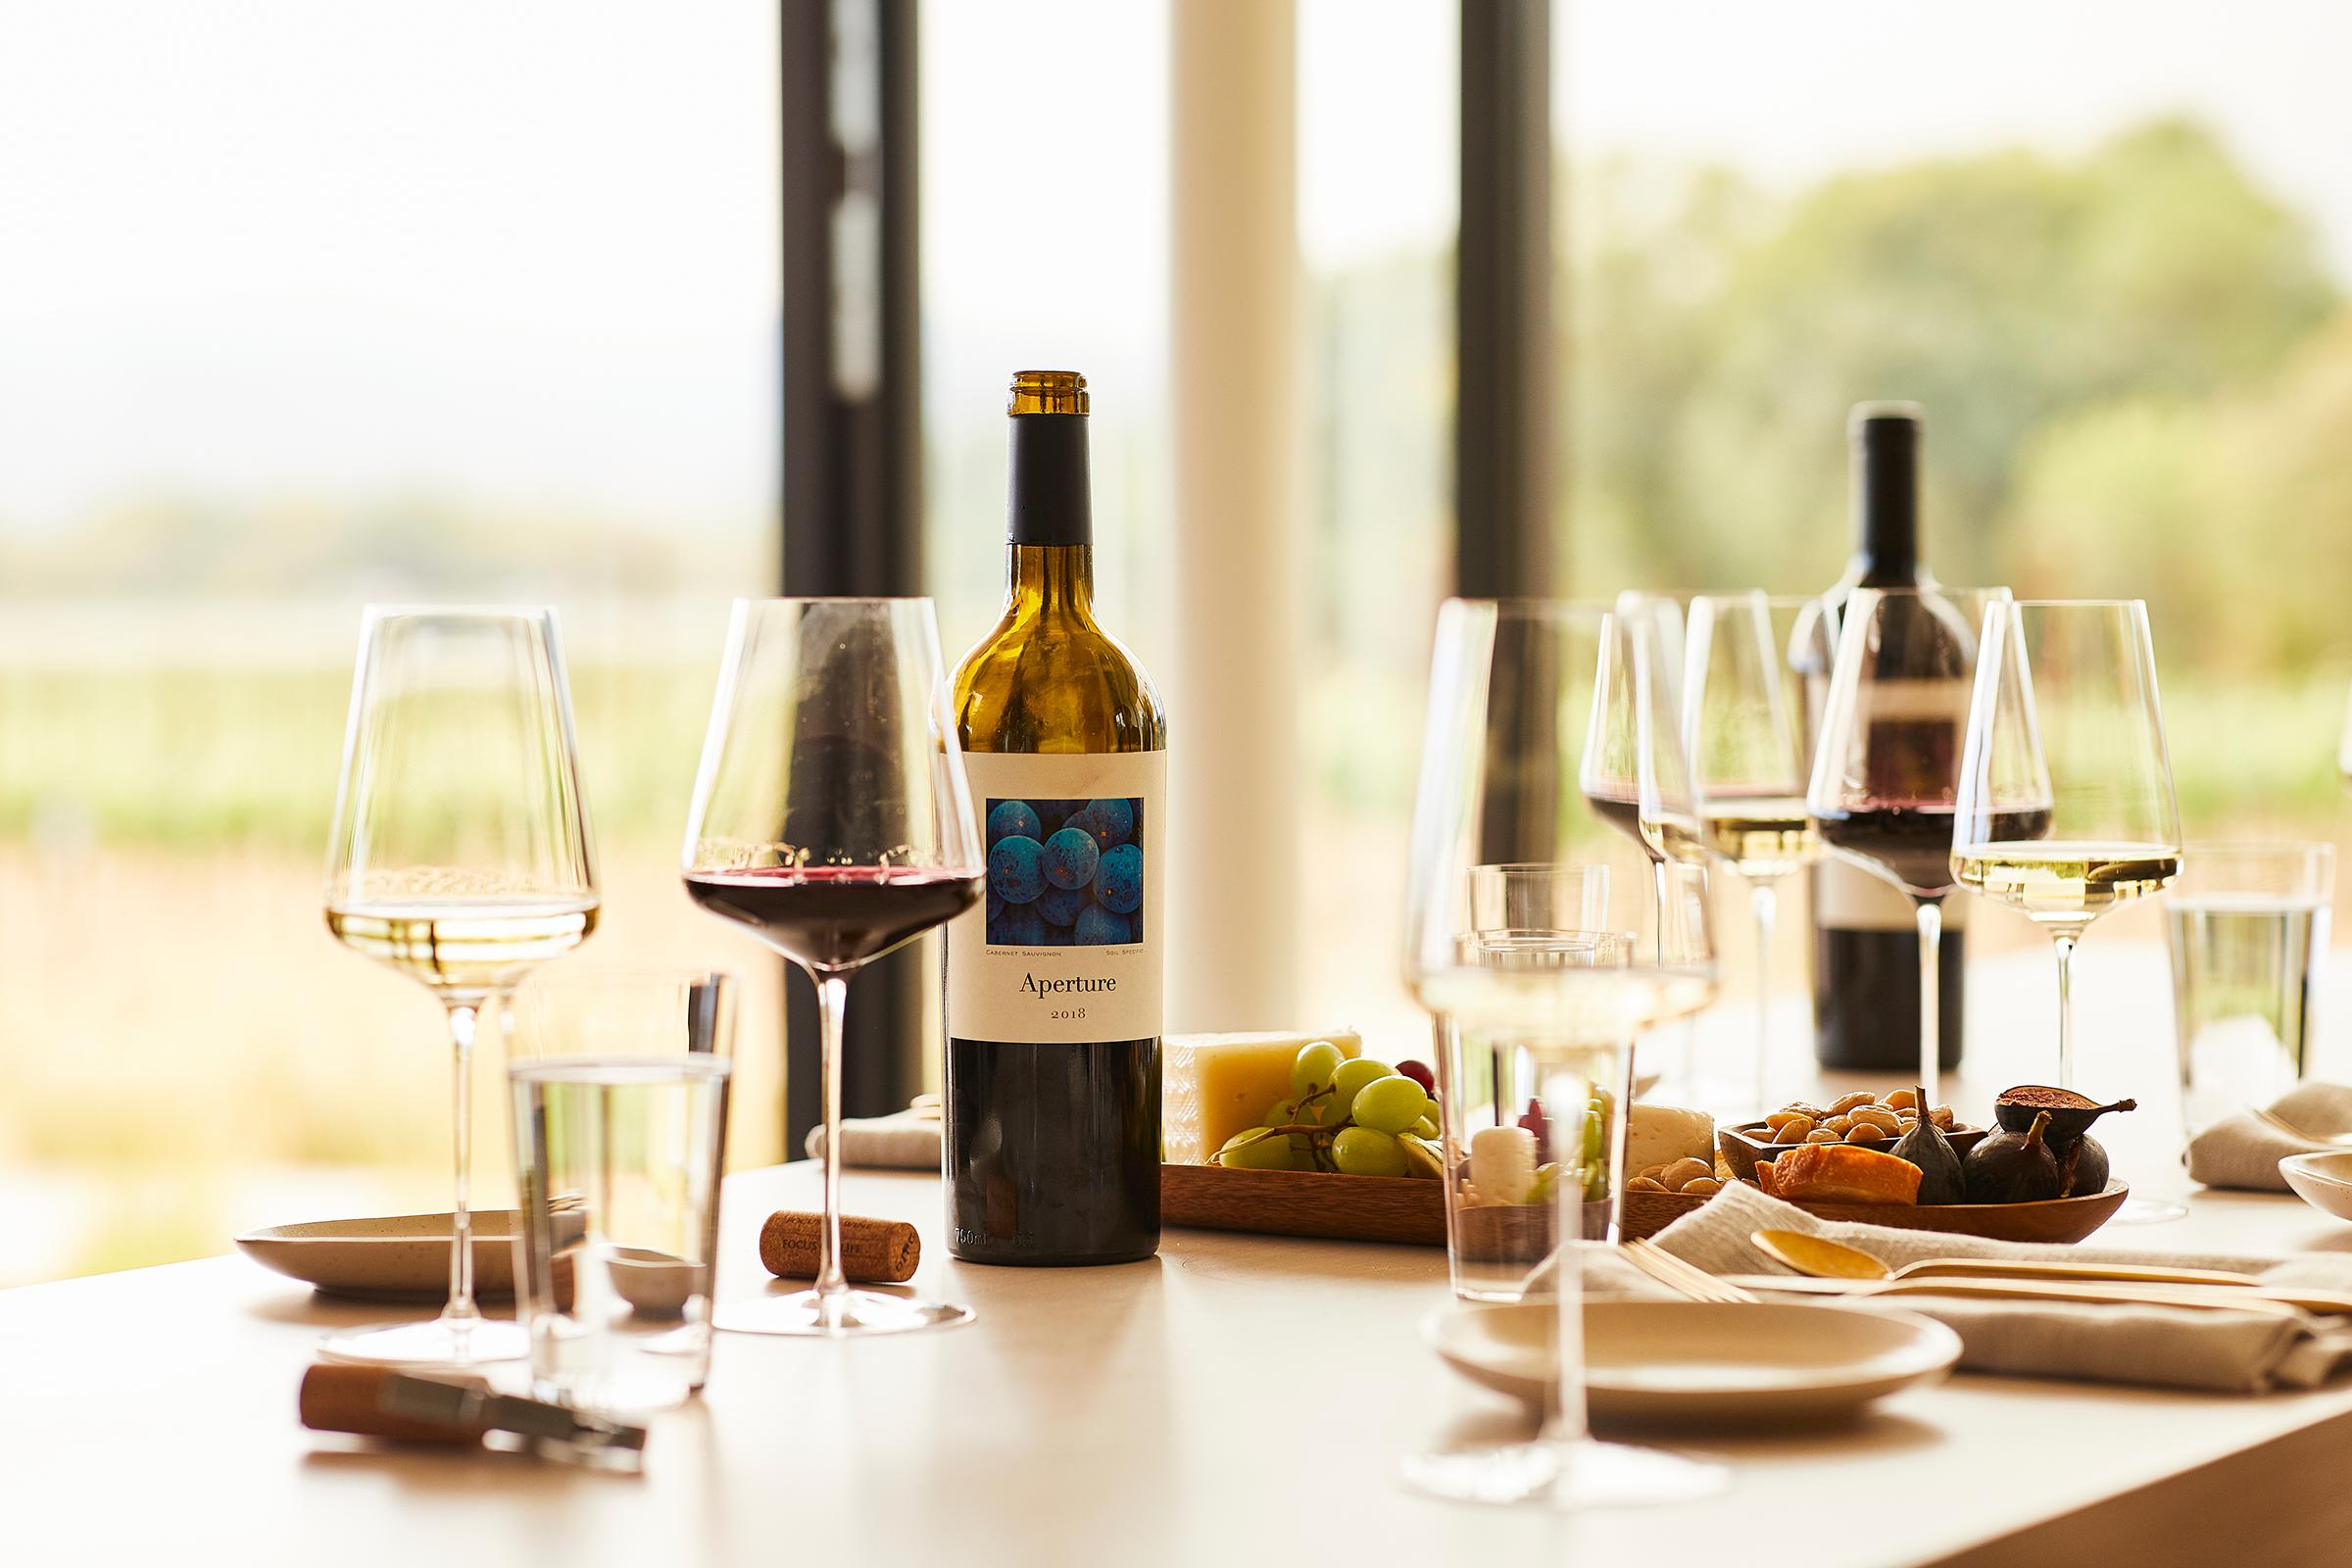 Aperture Winery Update